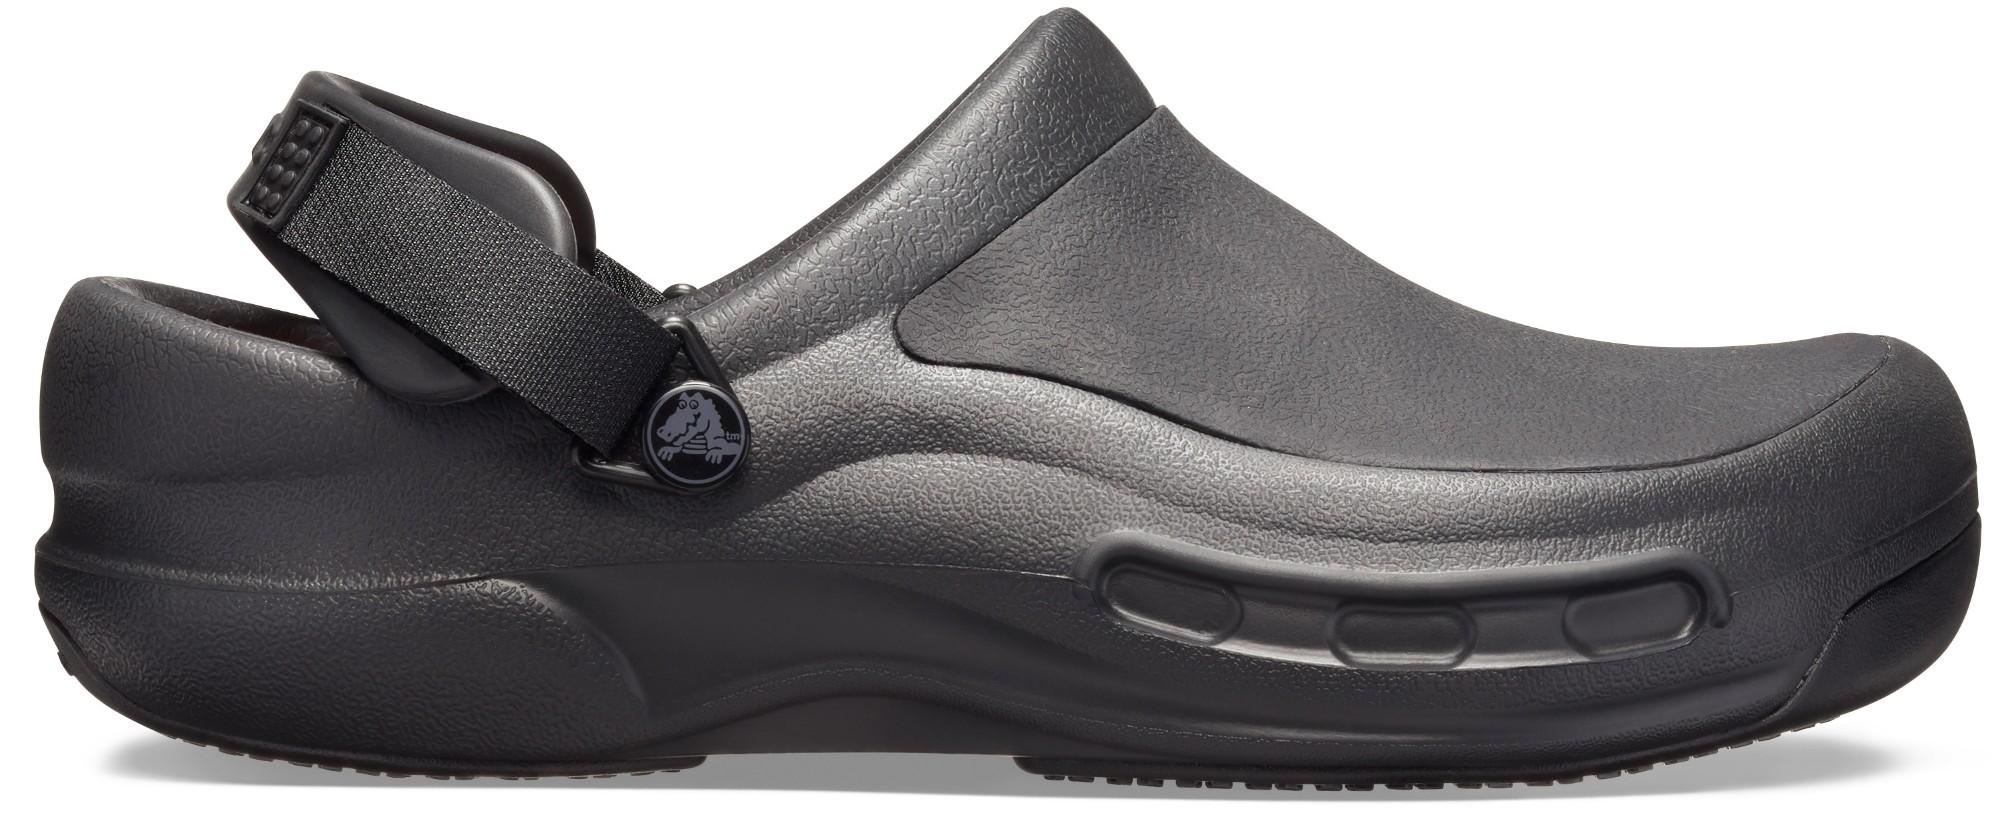 Crocs™ Bistro Pro LiteRide Clog Black 43,5